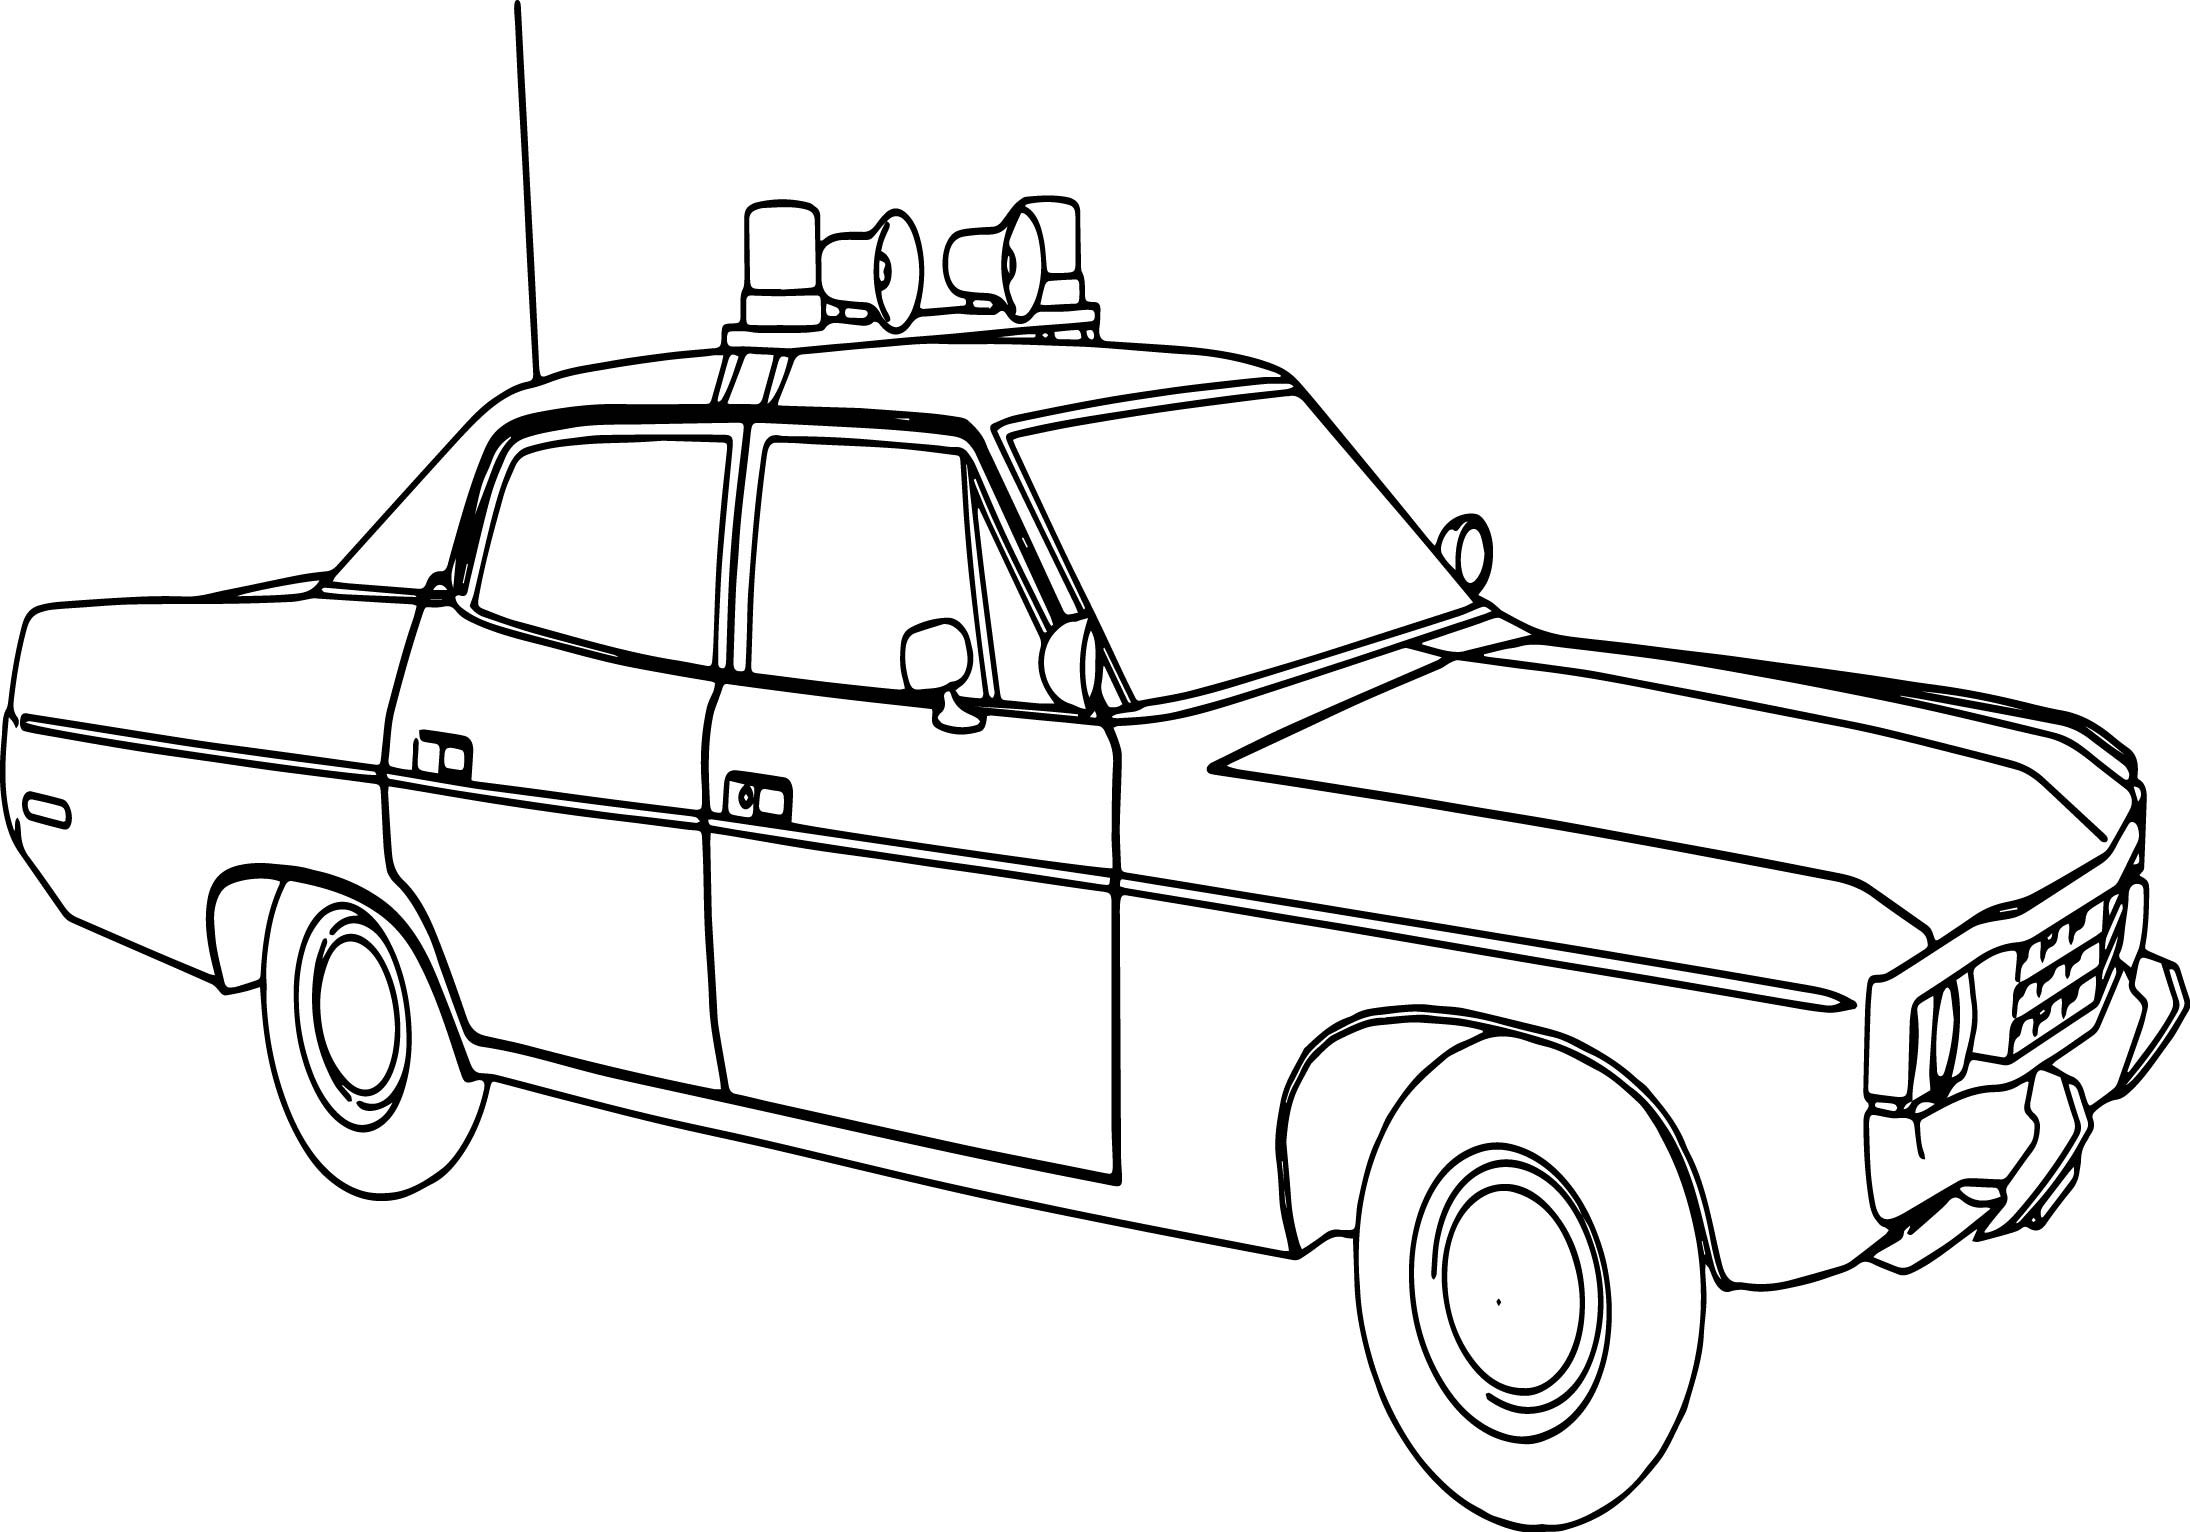 Police Car Drawing At Getdrawings